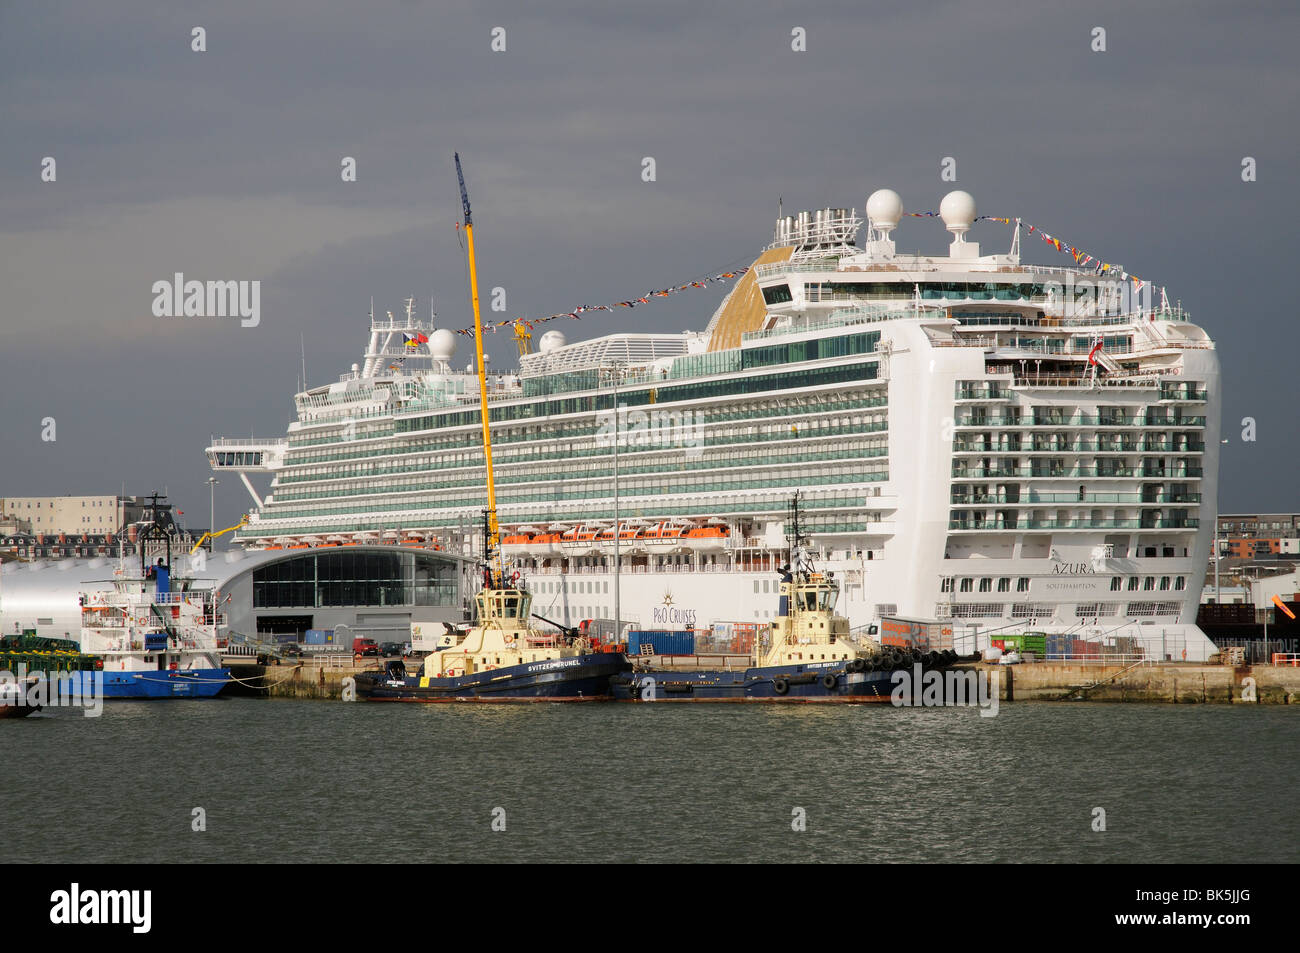 P&O Cruises cruise liner Azura berthed in Southampton England UK - Stock Image